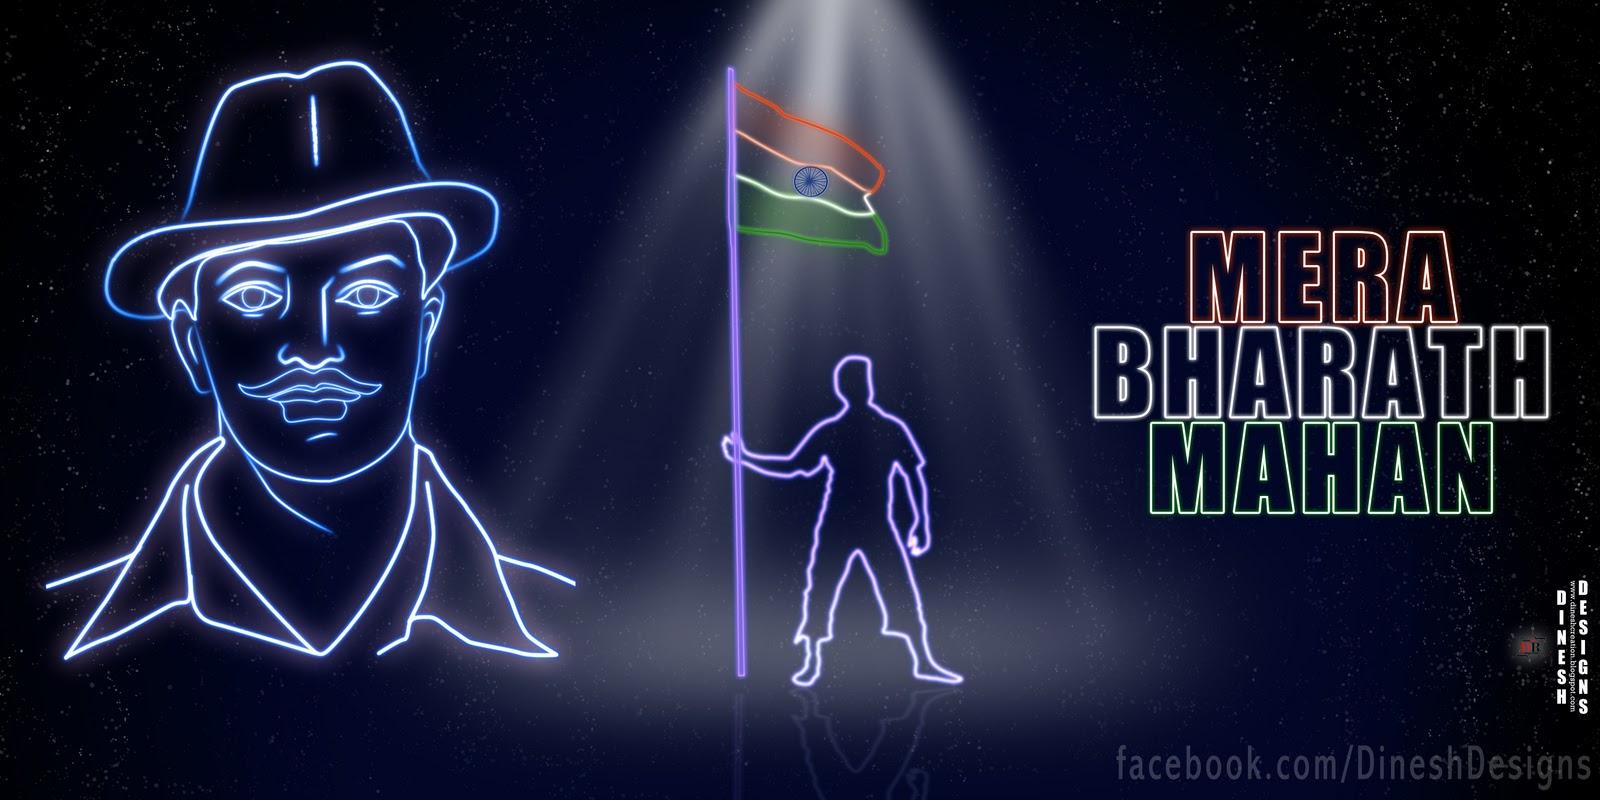 Dinesh Designs: Mera Bharath Mahan - Republic Day wallpaper